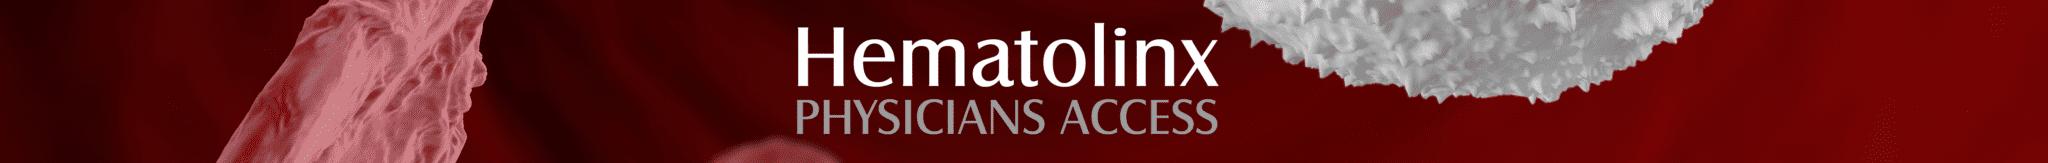 Hematologics